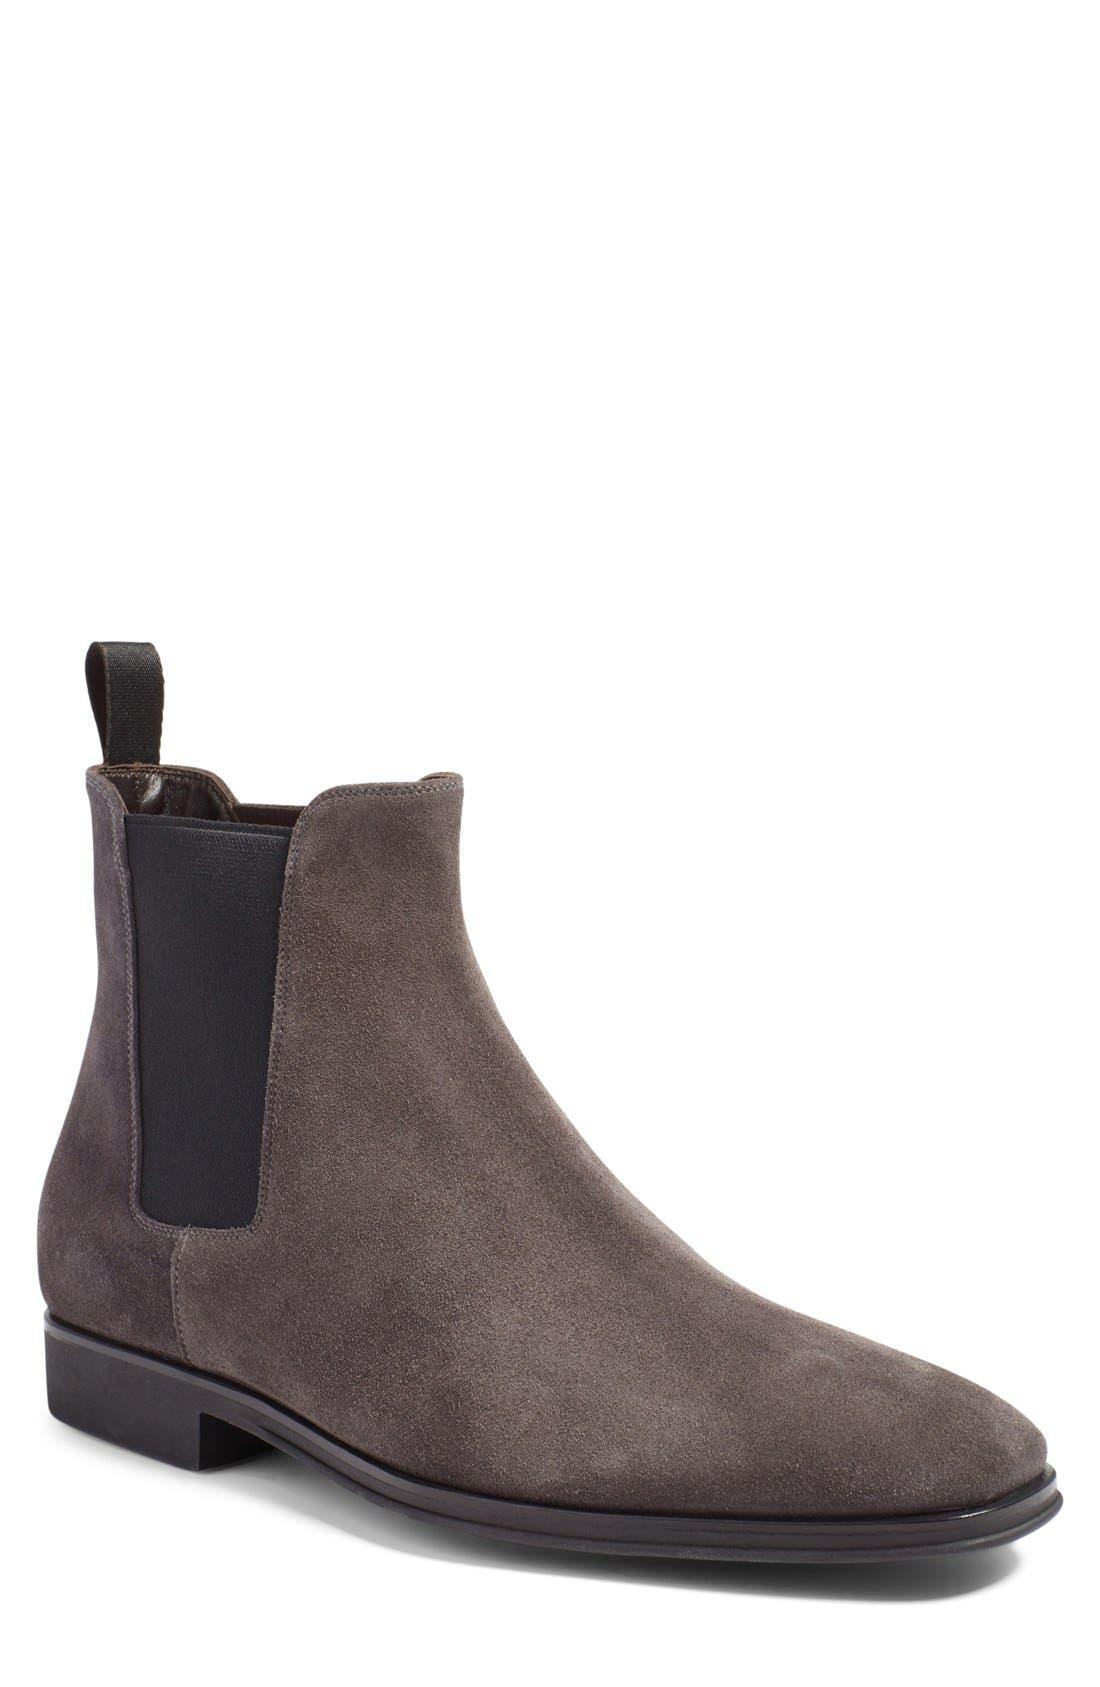 Monte Rosso Enrico Chelsea Boot (Men)